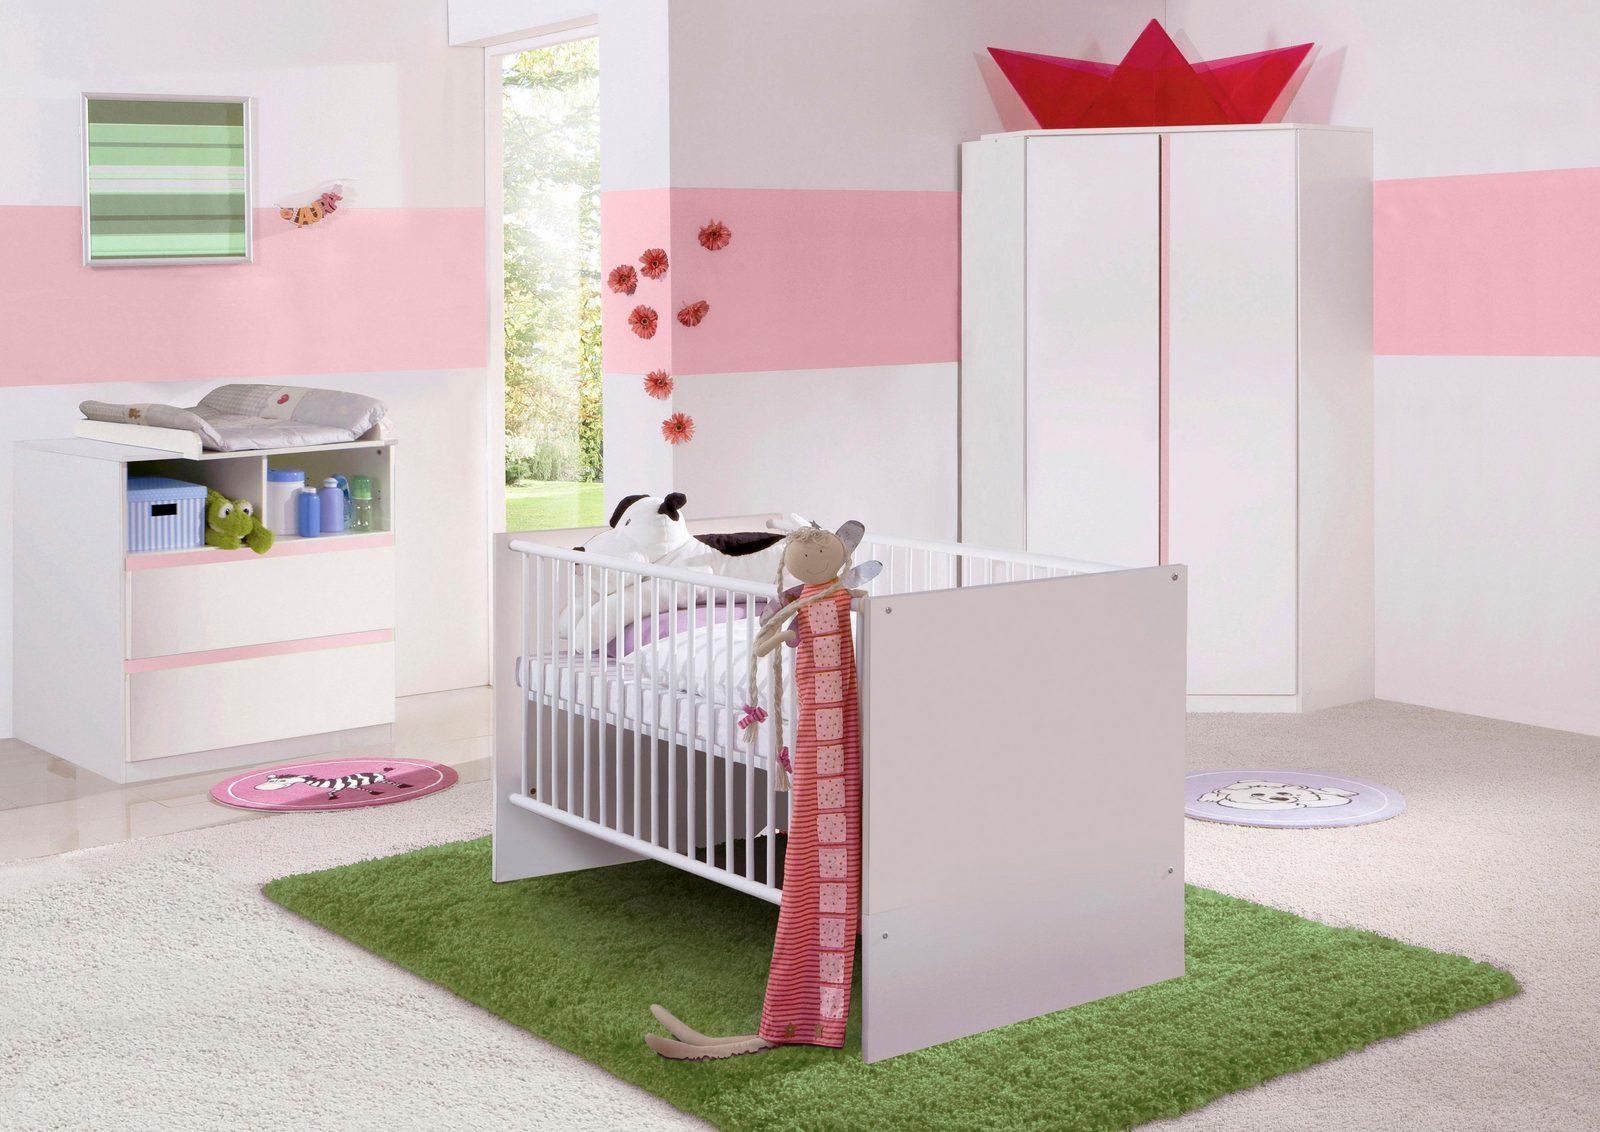 Komplett Babyzimmer »Rimini« Babybett + Wickelkommode Eckschrank, (3-tlg. Set), in alpinweiß/rosa